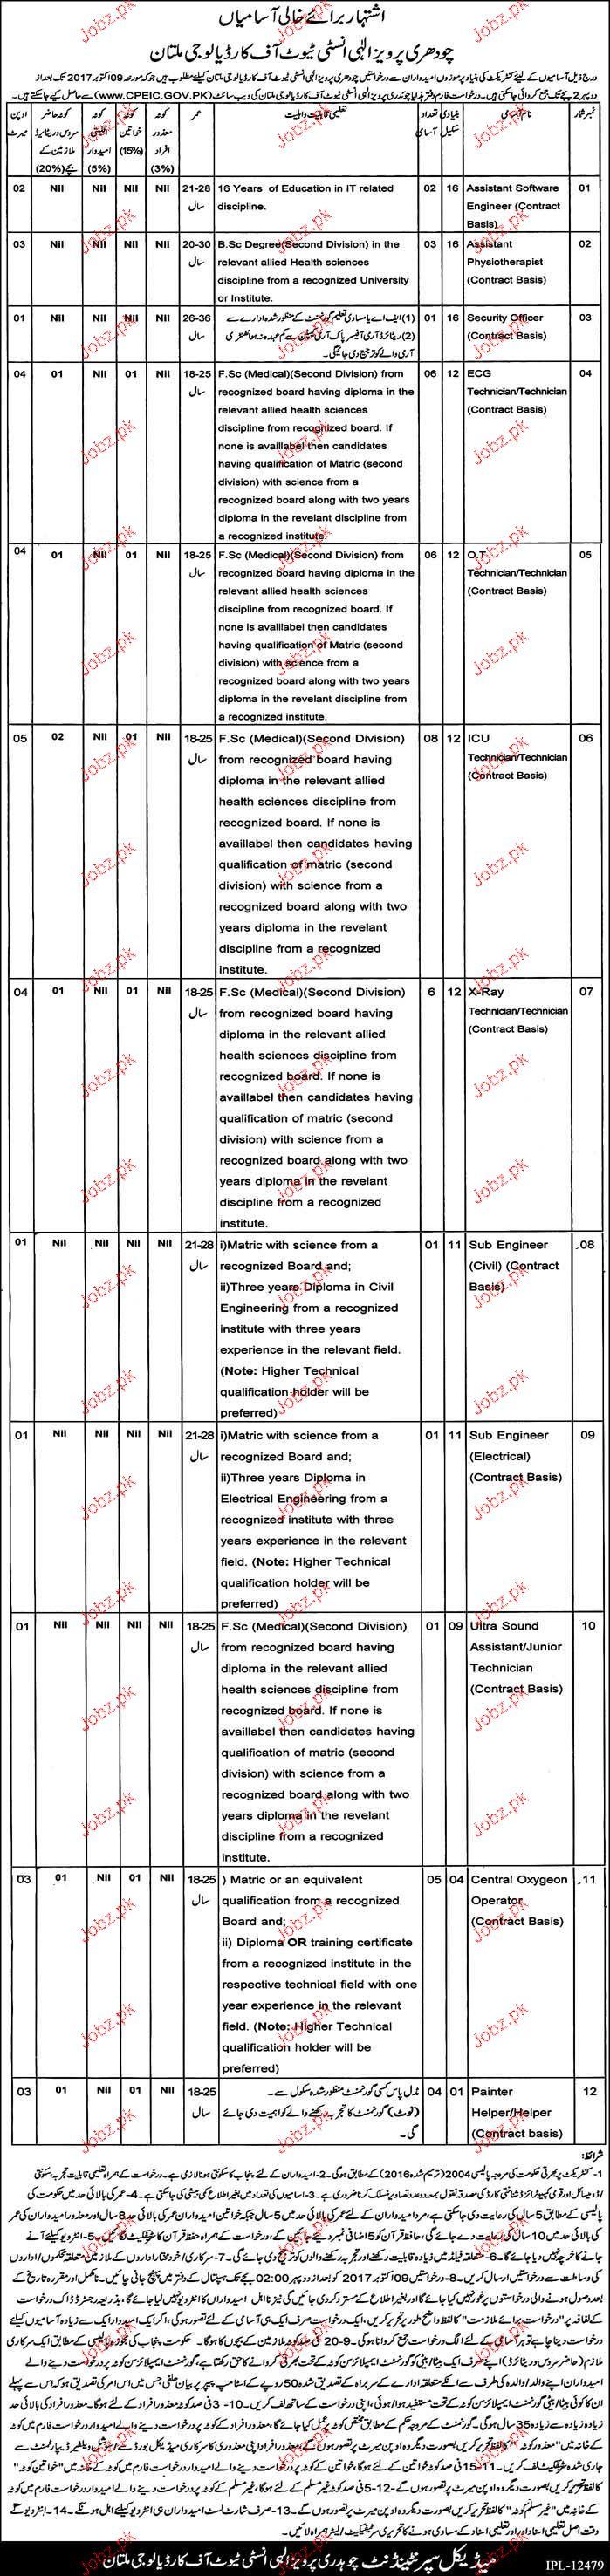 Choudhar Pervaiz Ellahi Institute of Cardiology Jobs